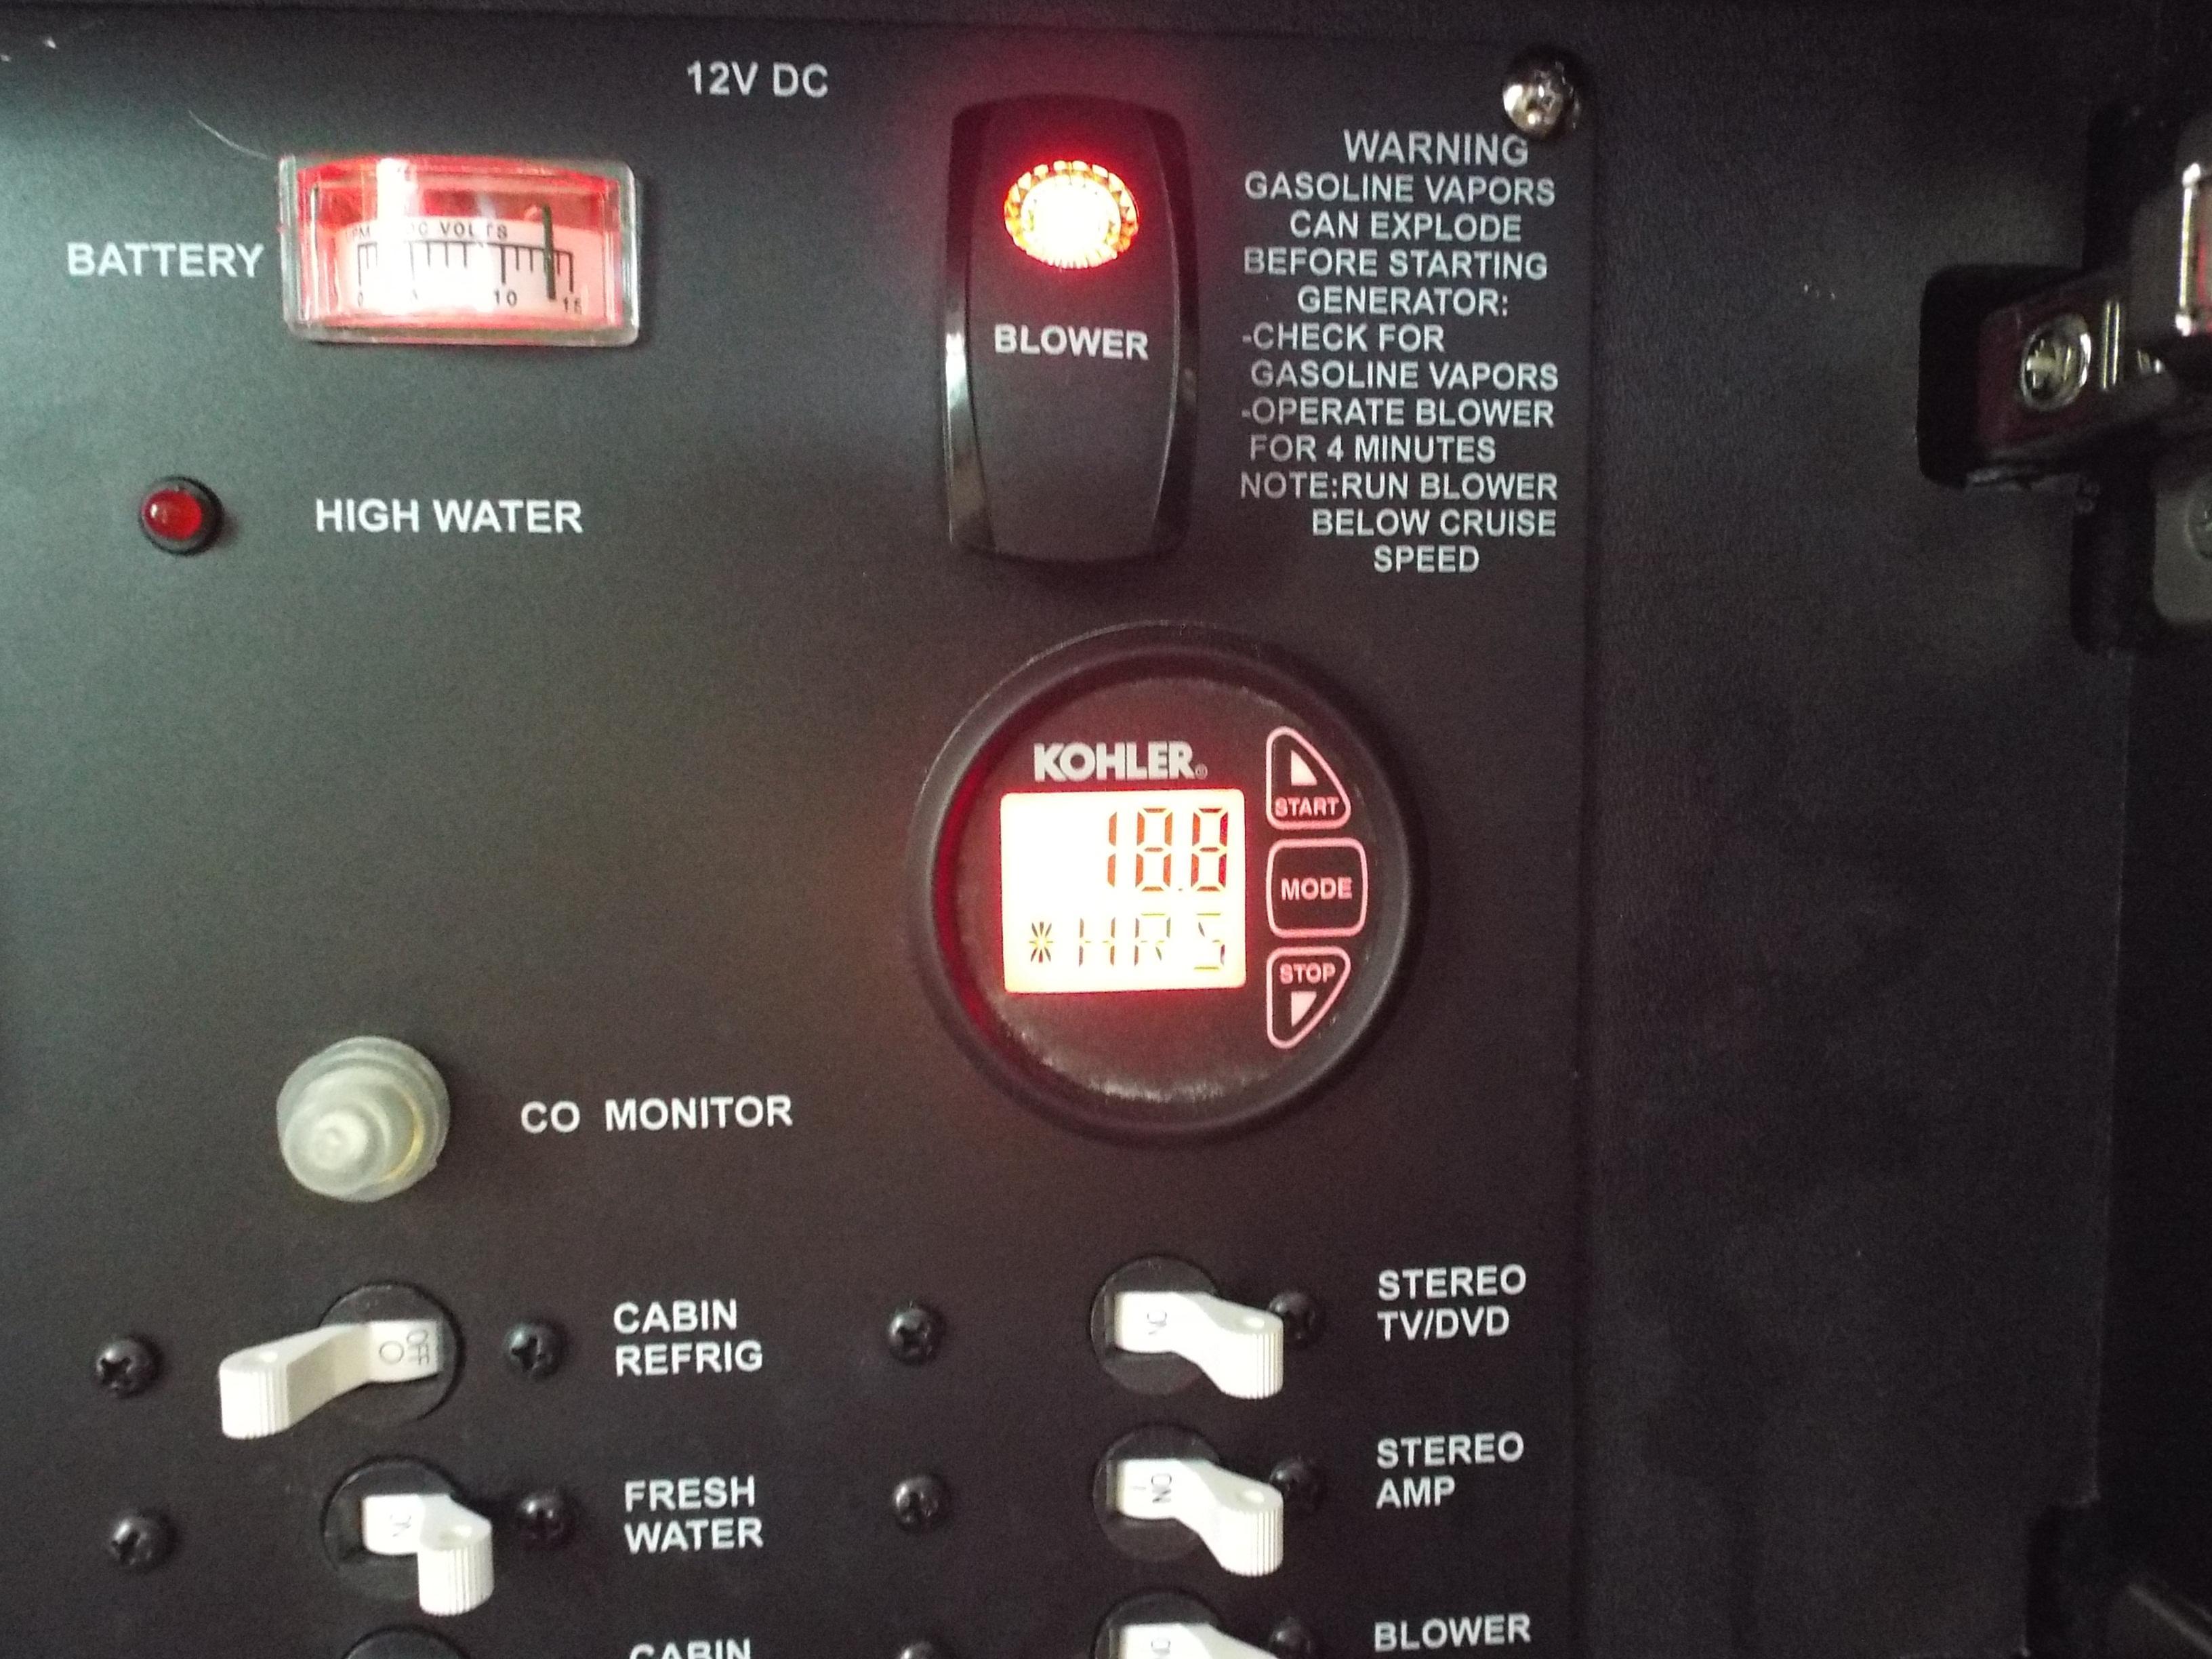 18 Hours on Generator